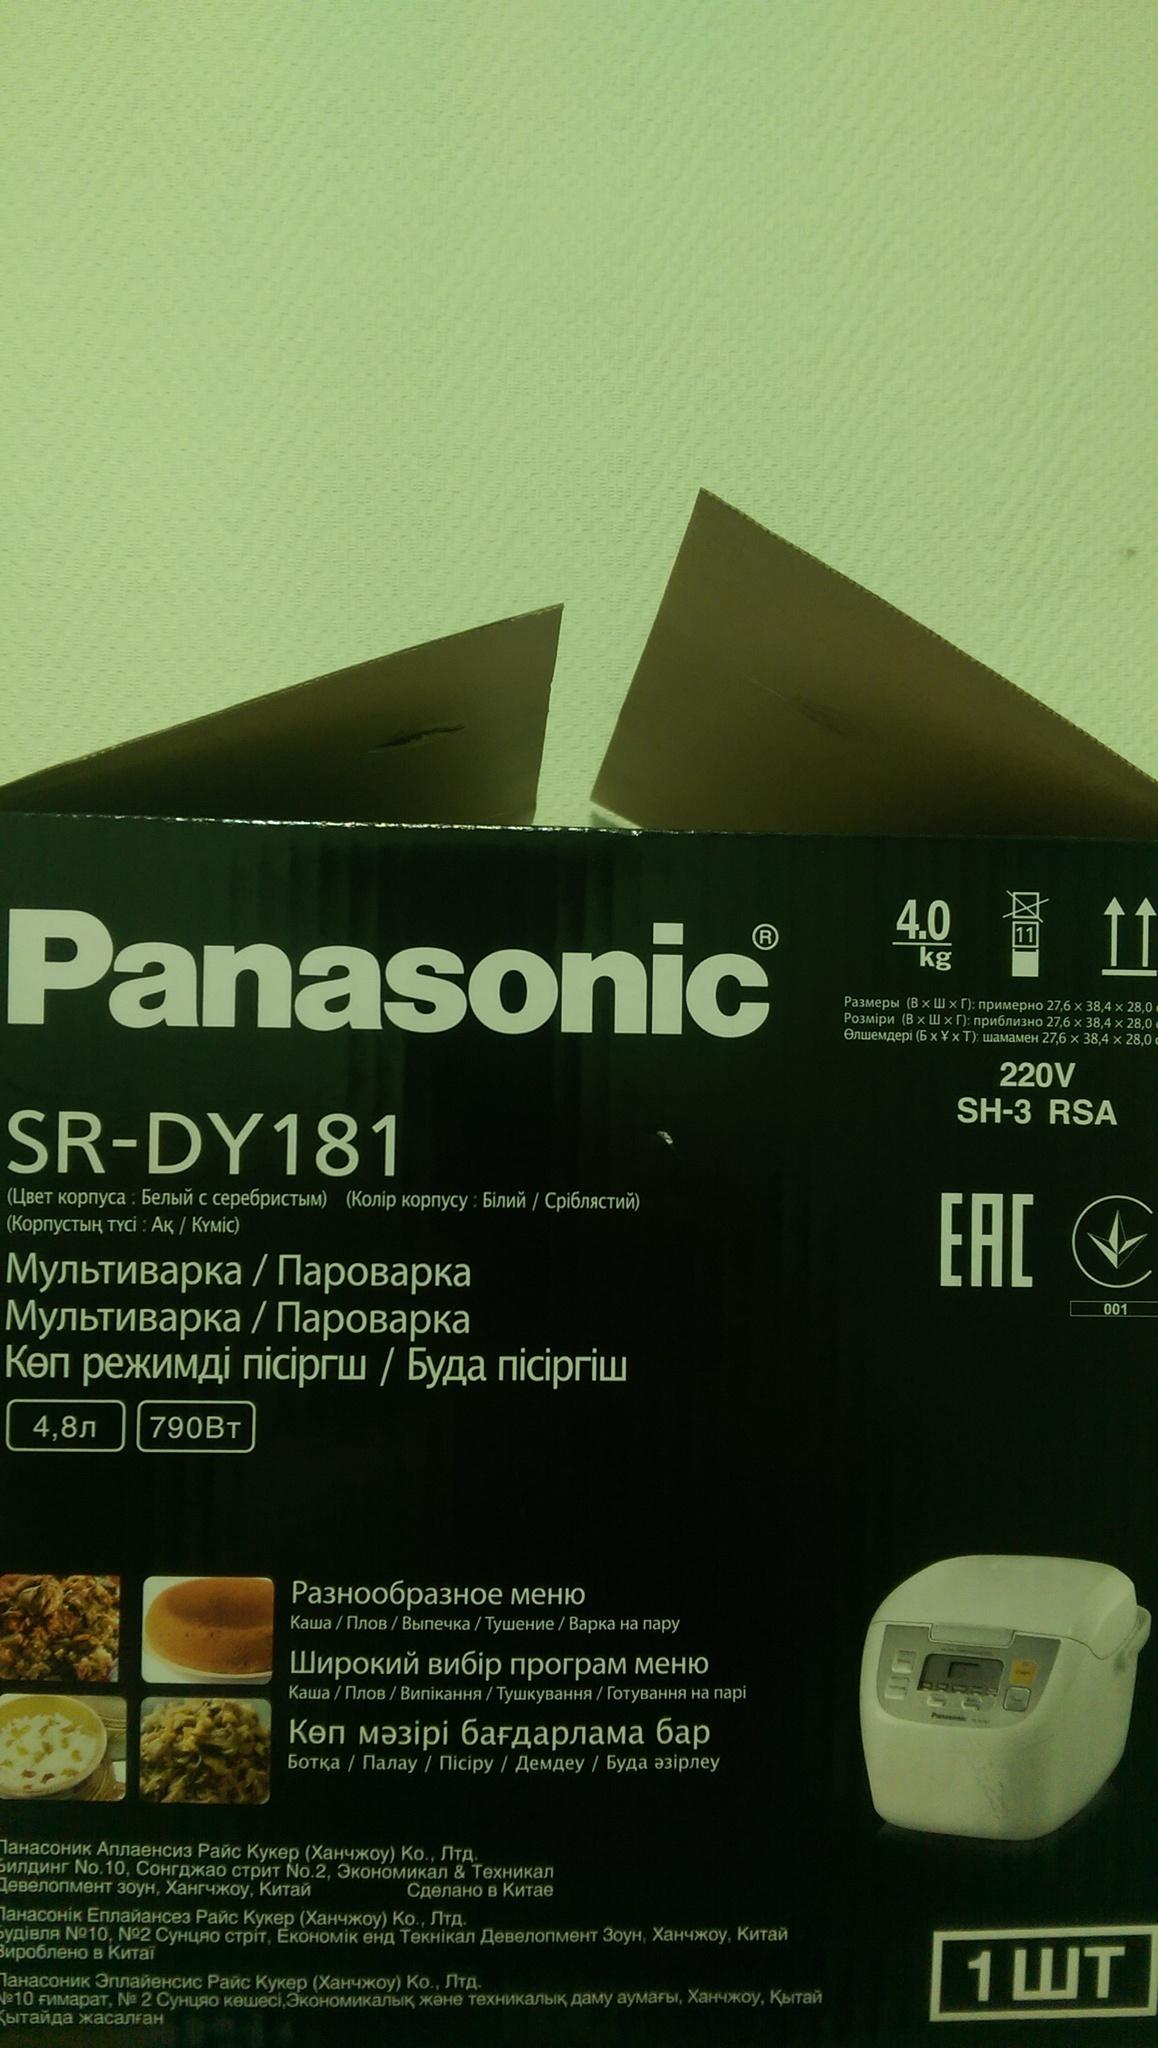 Мультиварка Panasonic SR-DY181WTQ Вес в Упаковке составляет 4.0 кг